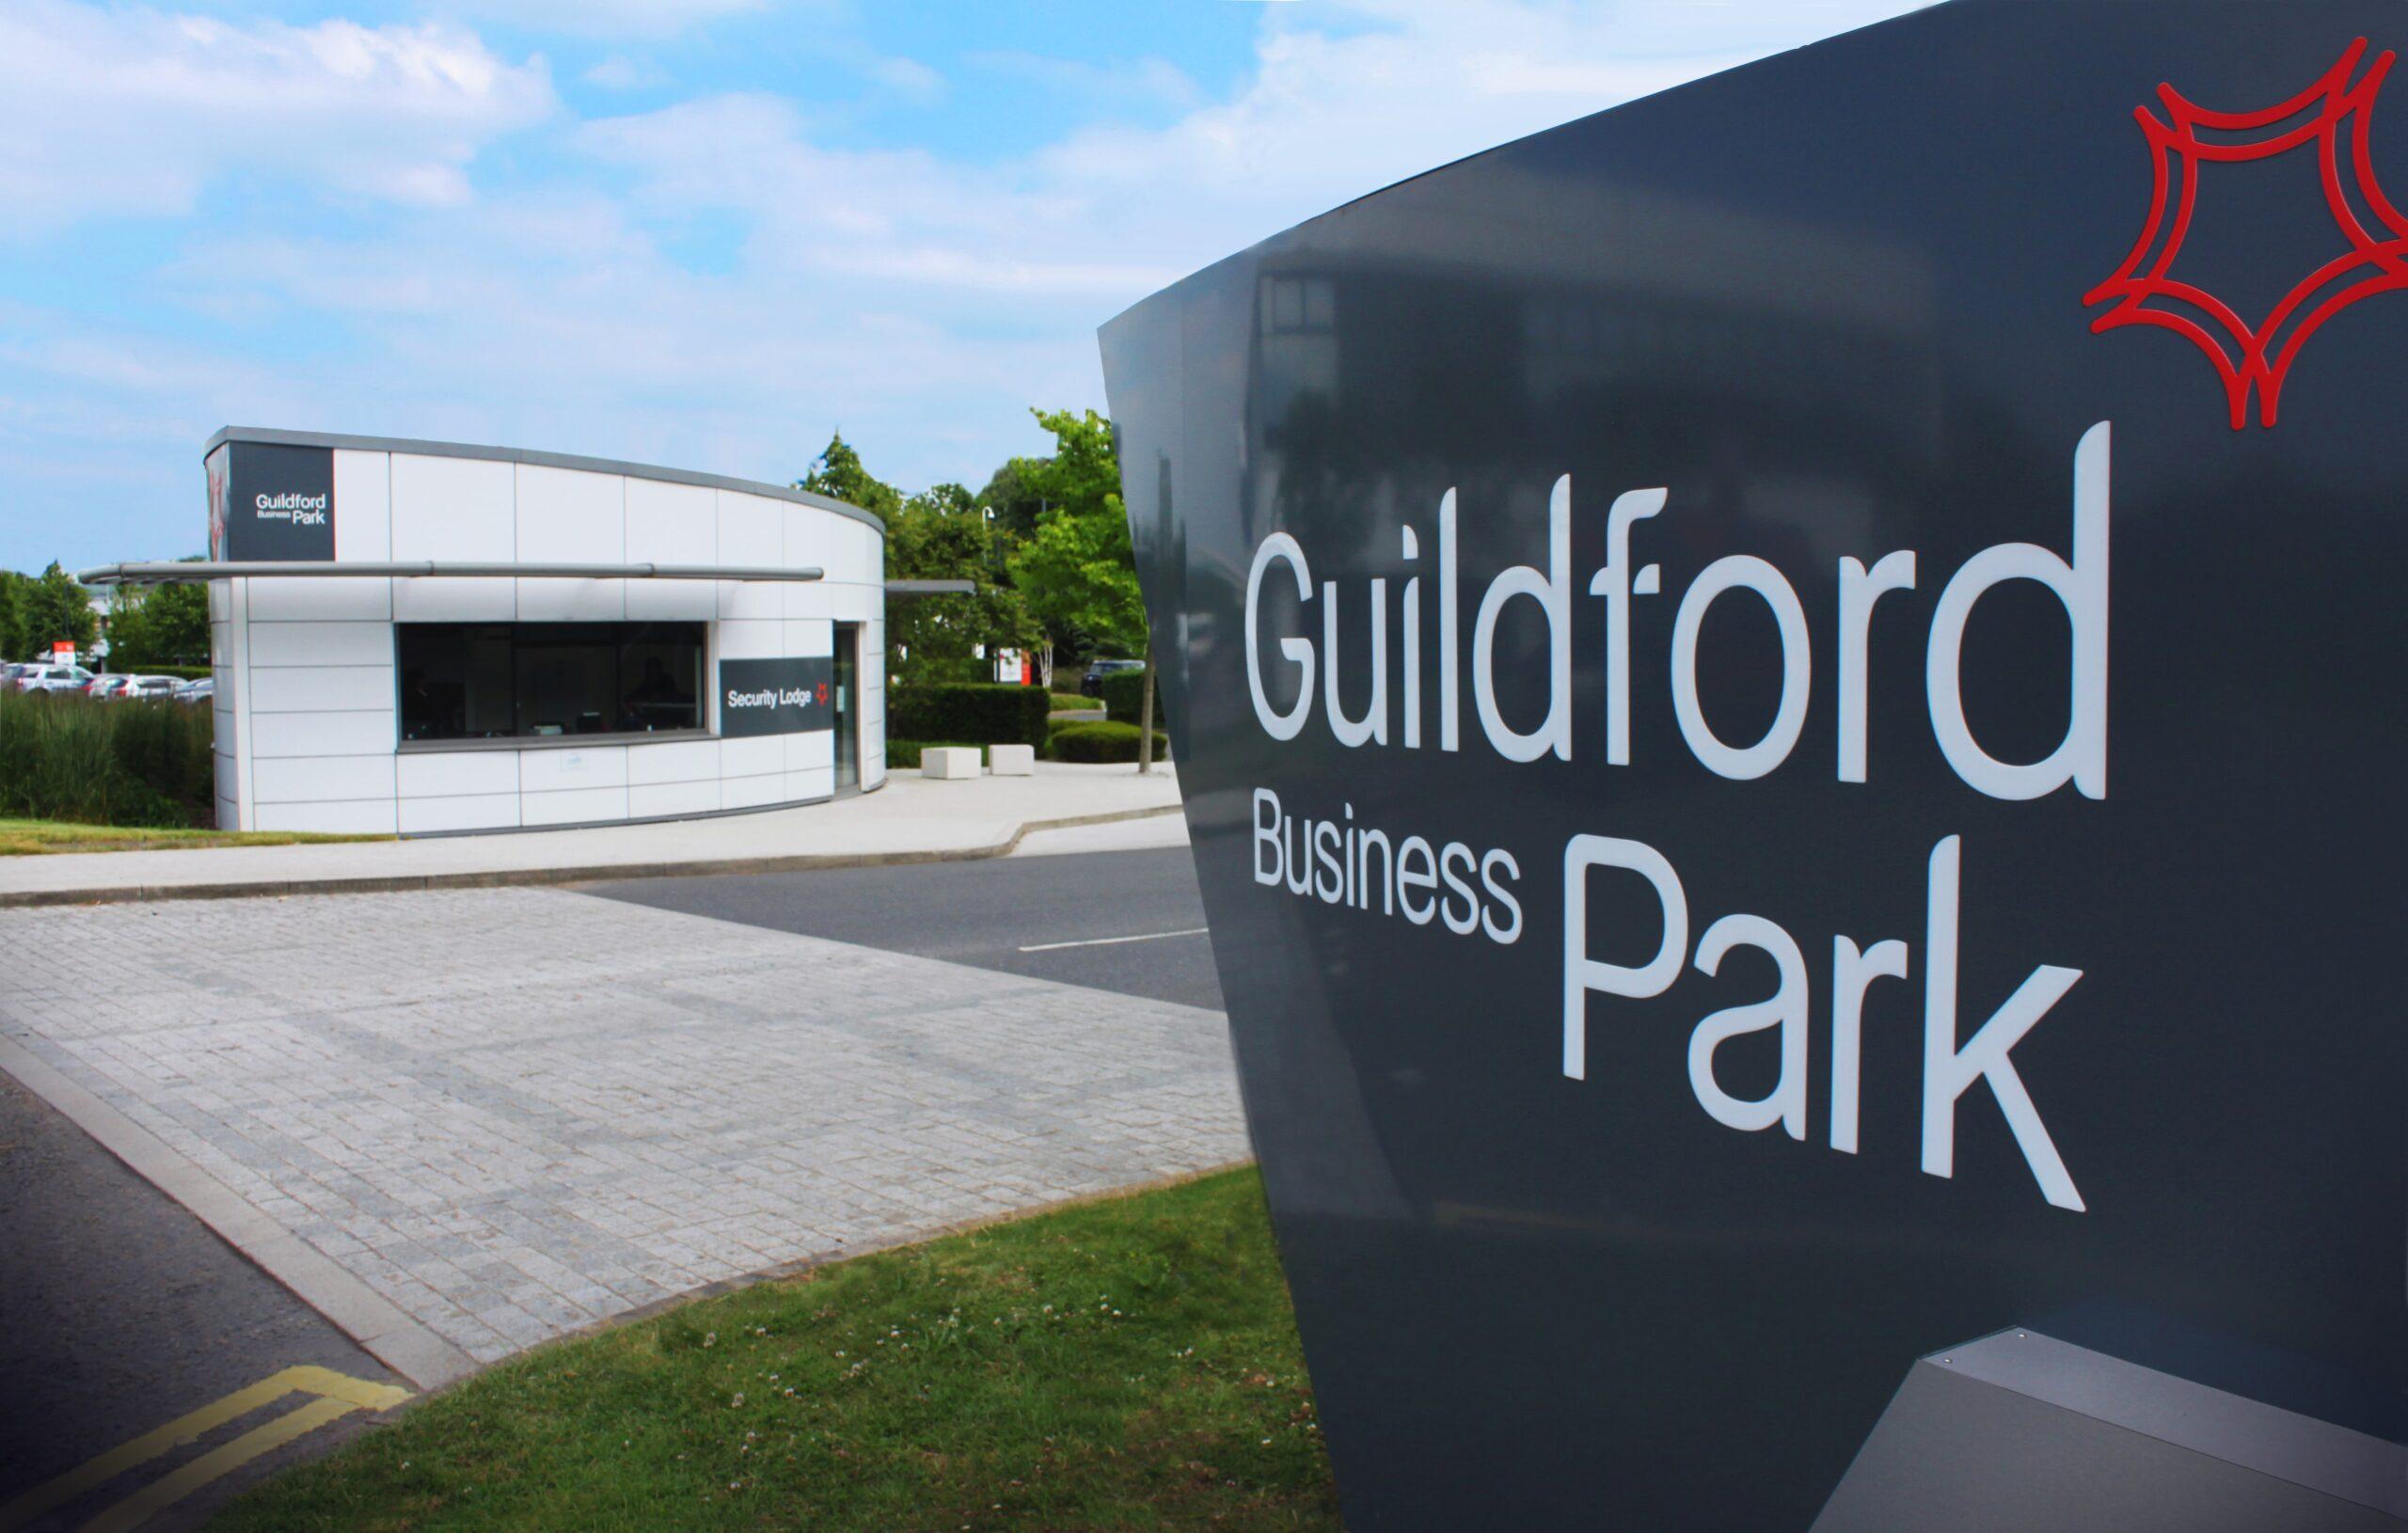 Guildford-Business-Park-1-min